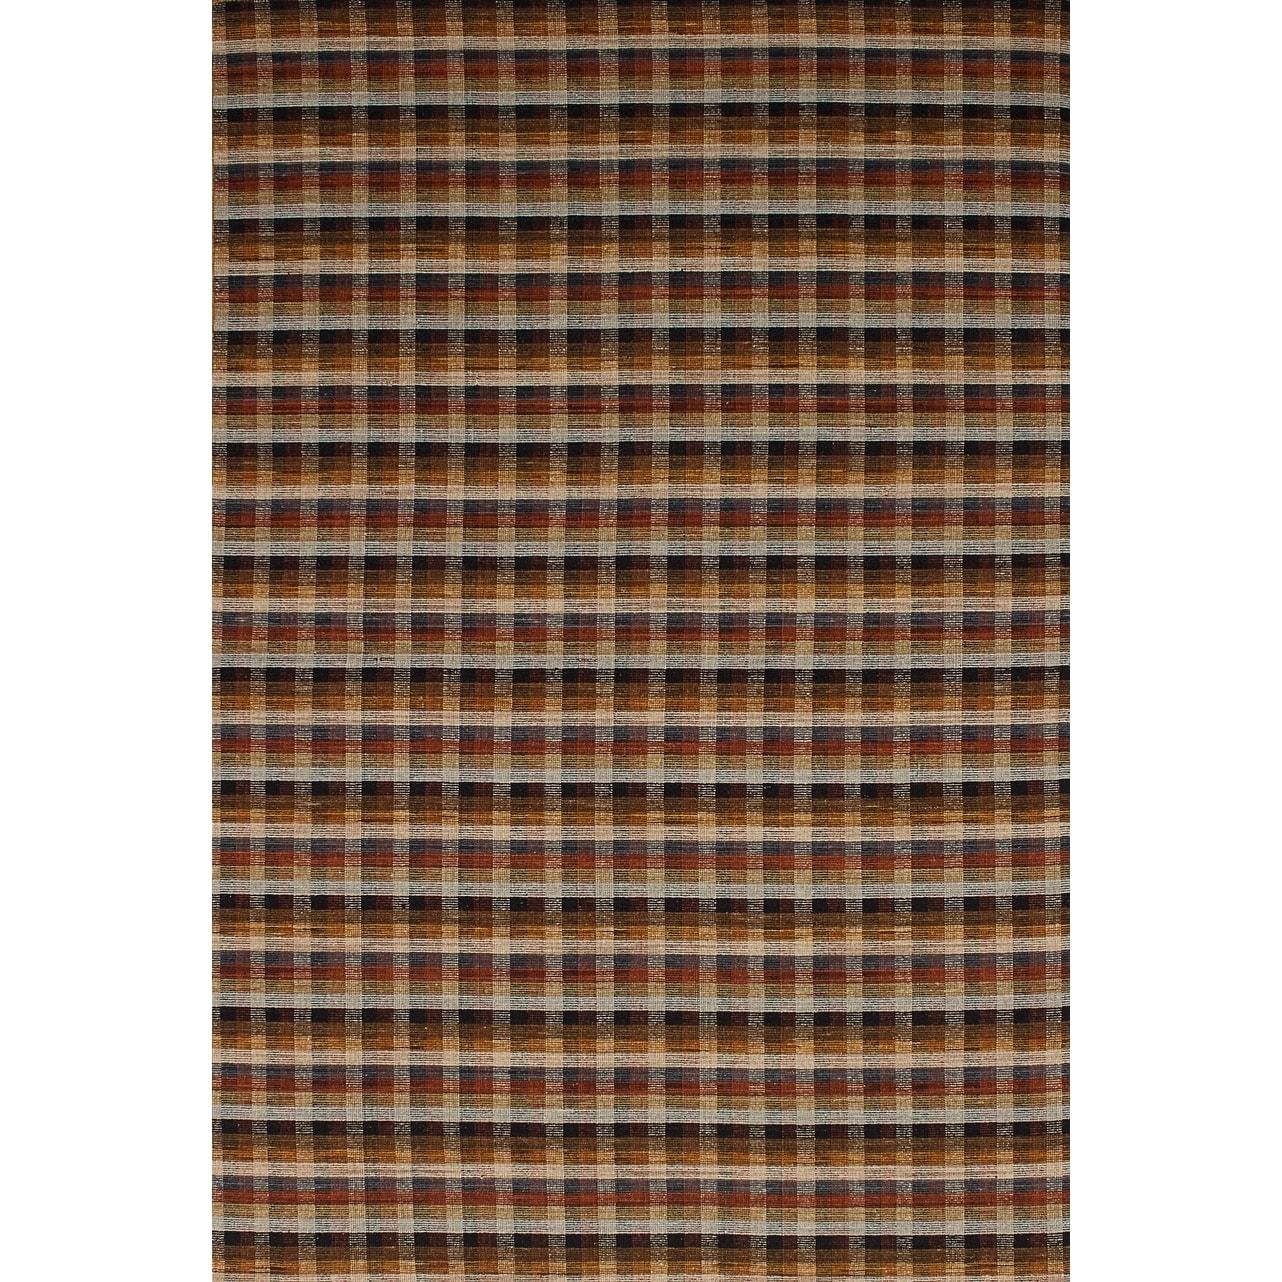 ECARPETGALLERY Flat-weave Manhattan Brown, Dark Red Wool Sumak - 50 x 77 (Brown/Red - 50 x 77)